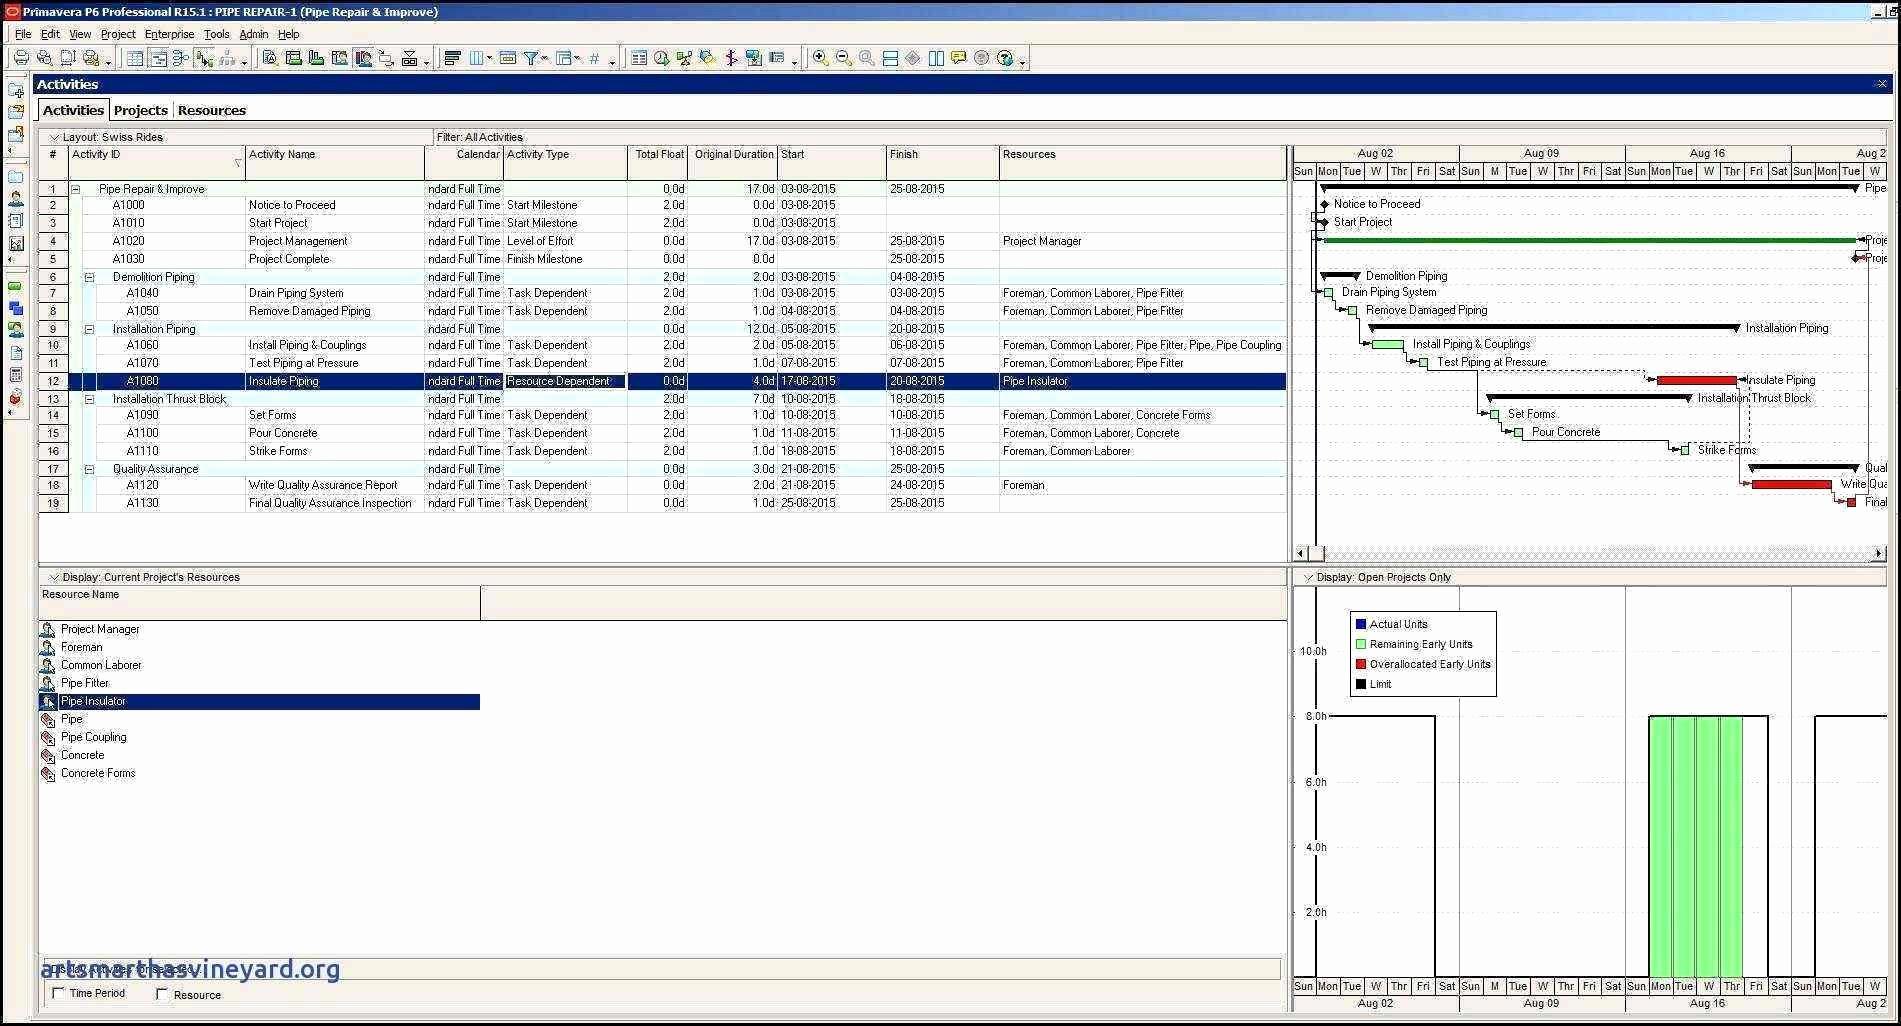 Kalender 2019 Excel Datei Más Recientemente Liberado Kalender 53 Galerien Von Kalender 2018 Excel Twinnote Of Kalender 2019 Excel Datei Más Recientes Projektplan Excel